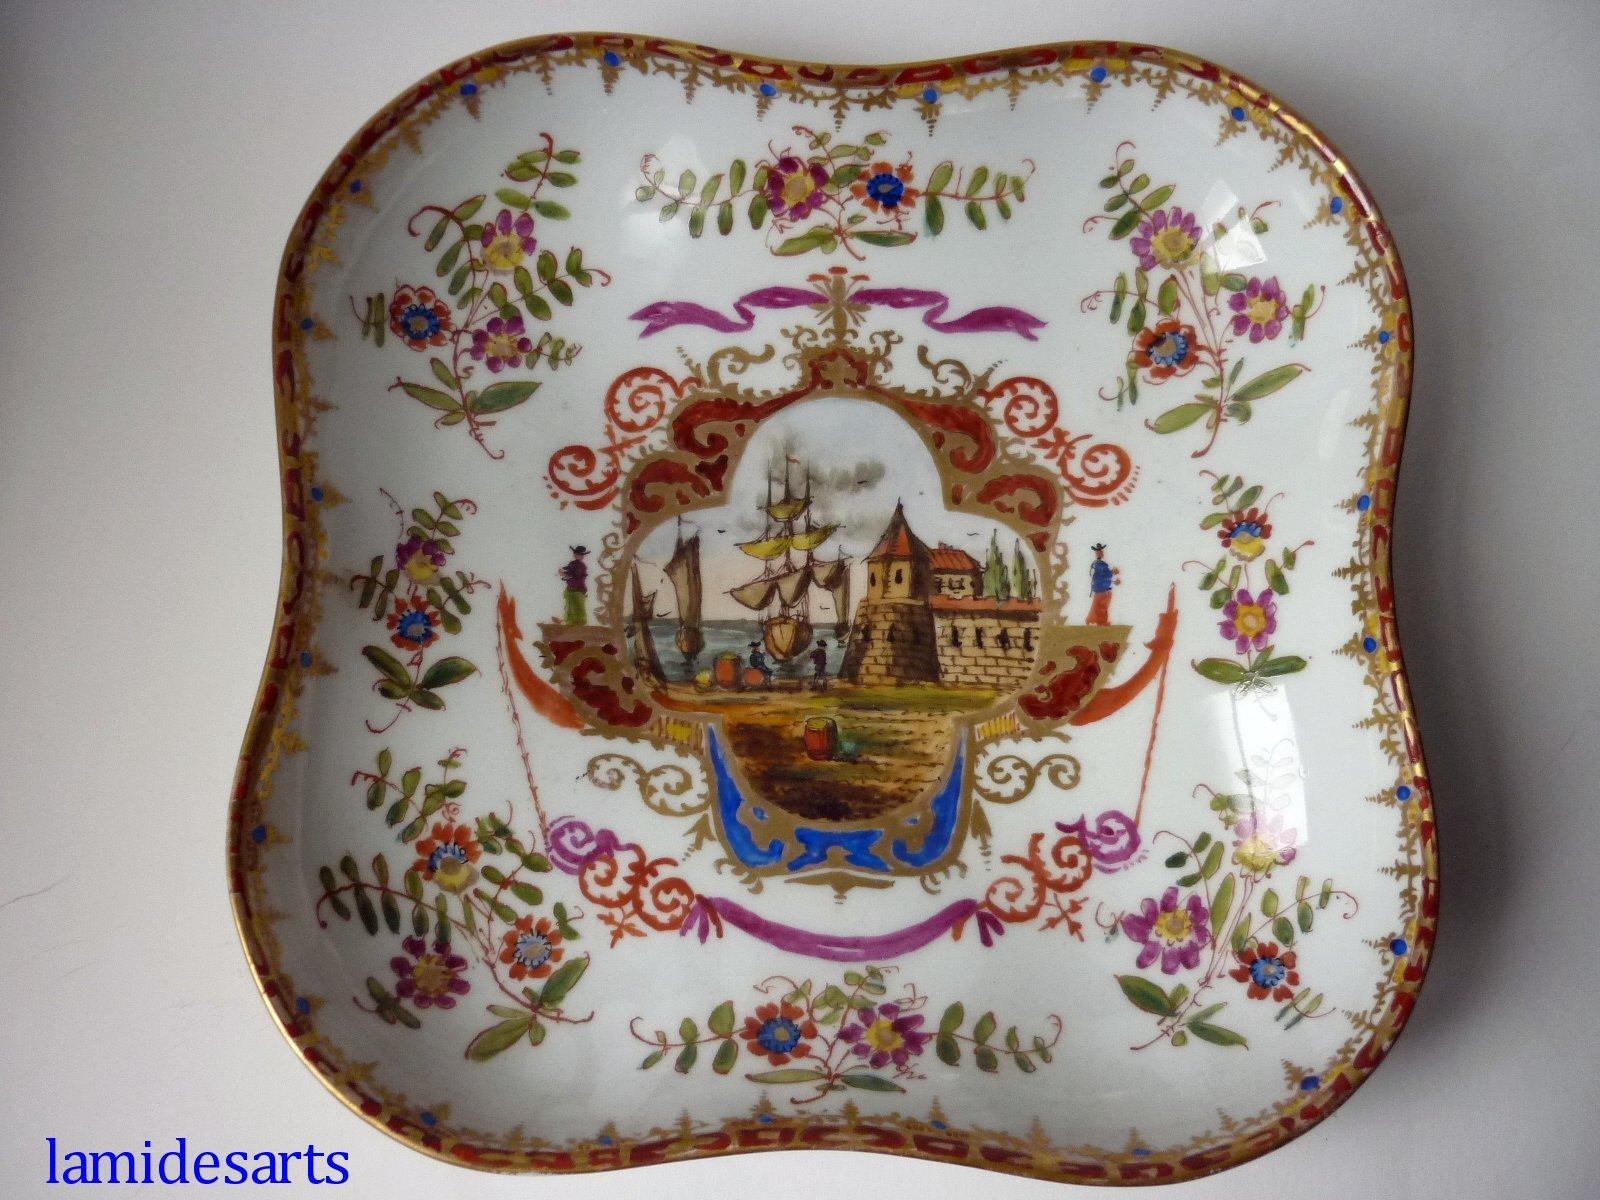 Carl Knoll Fischern Karlsbad Porcelain Dish 1850 1860